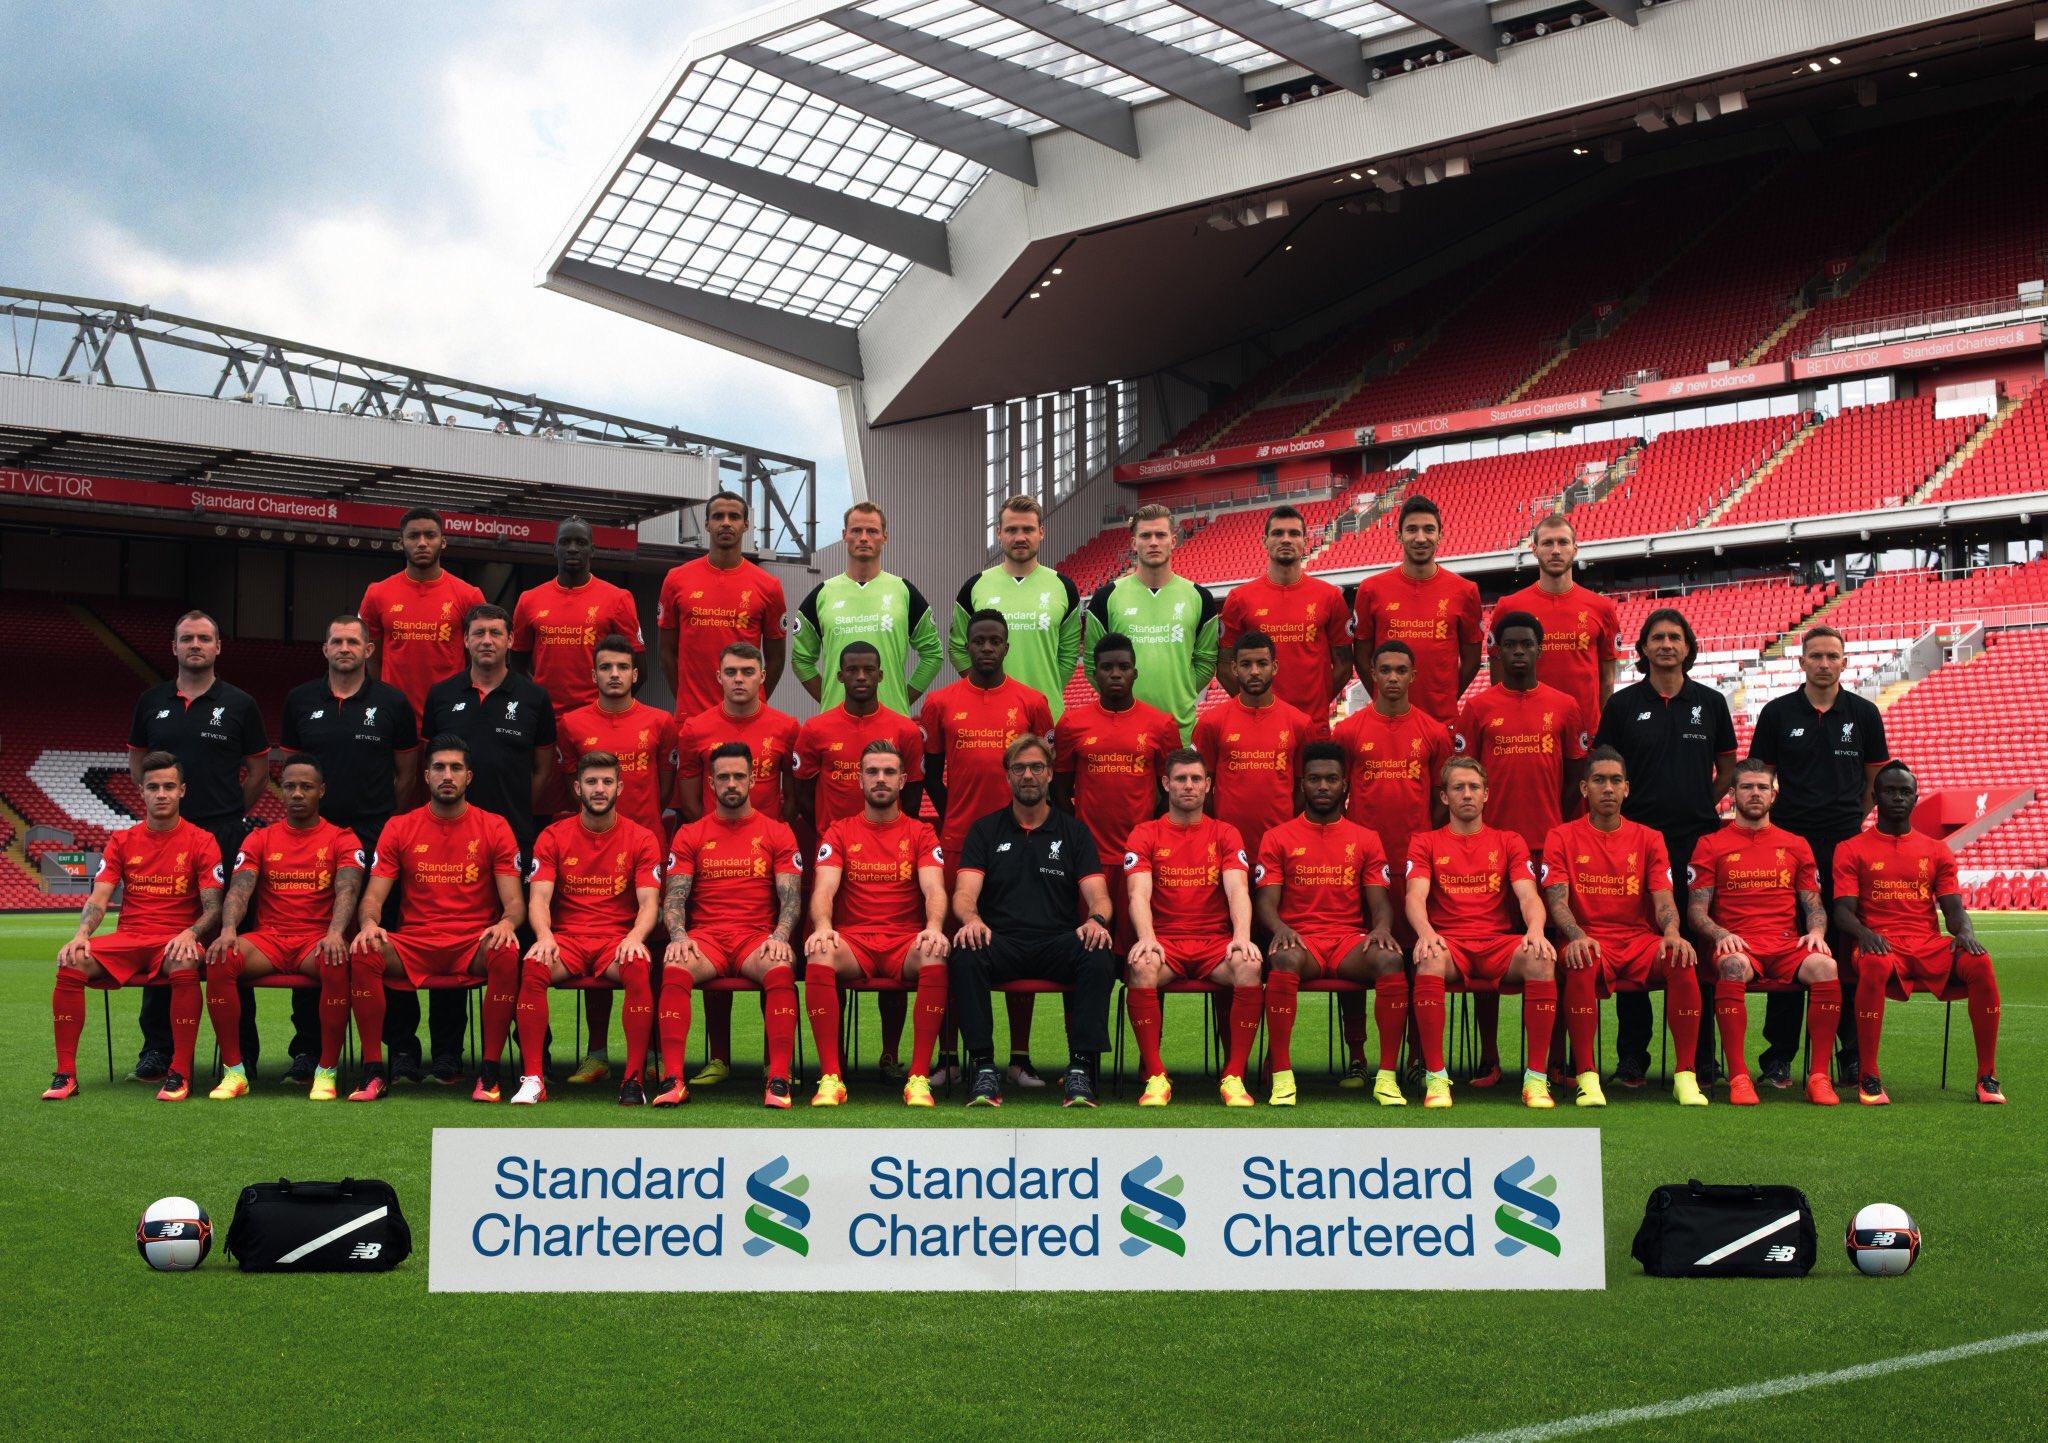 Hilo del Liverpool FC CtjZJsCXYAAOtWR